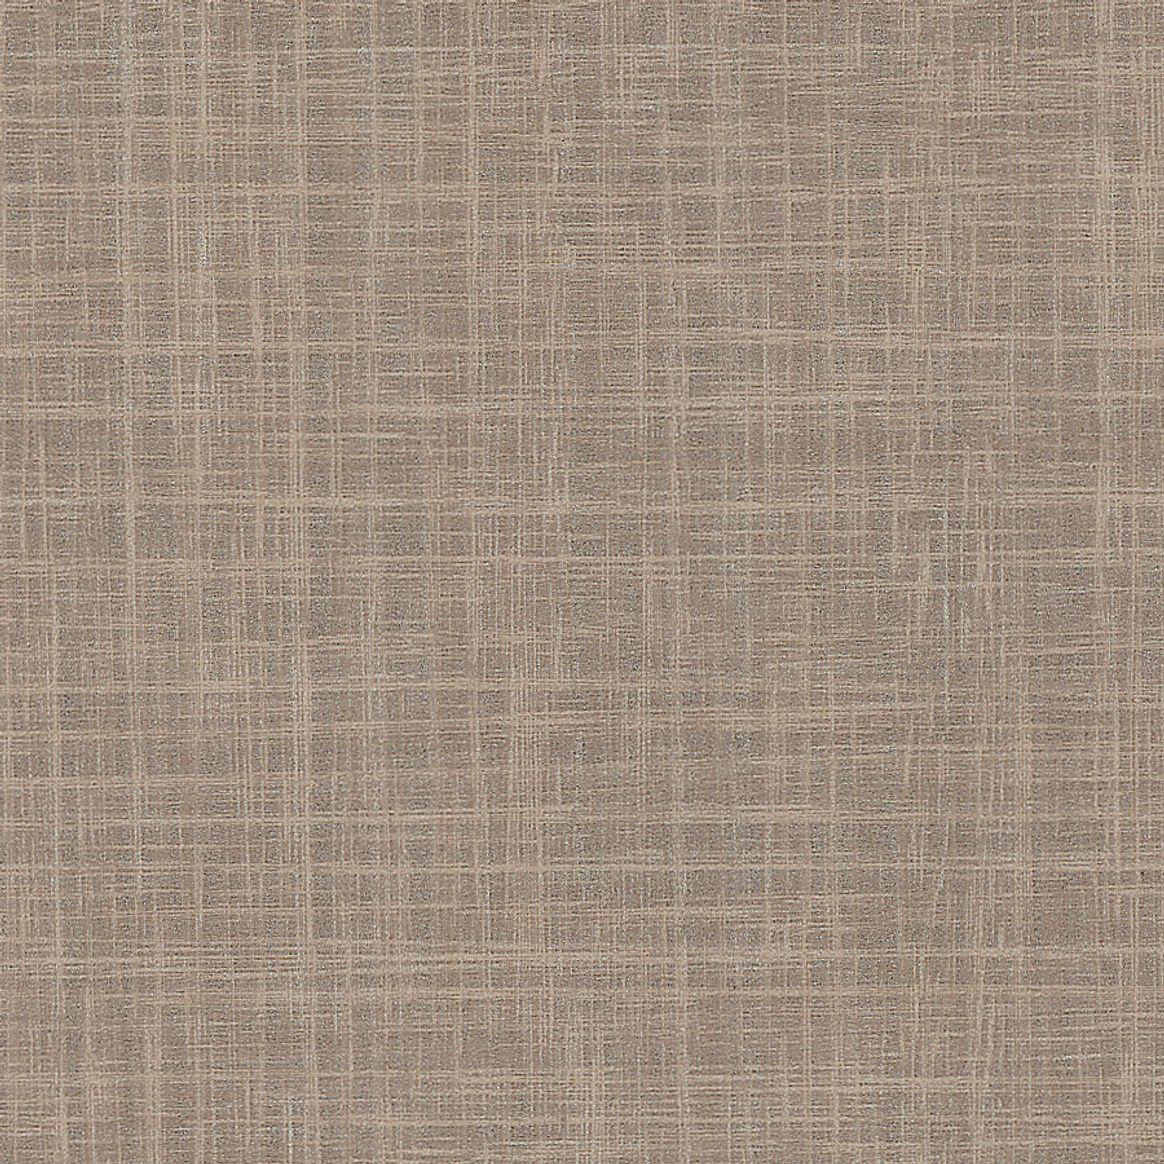 Linen Weave tile